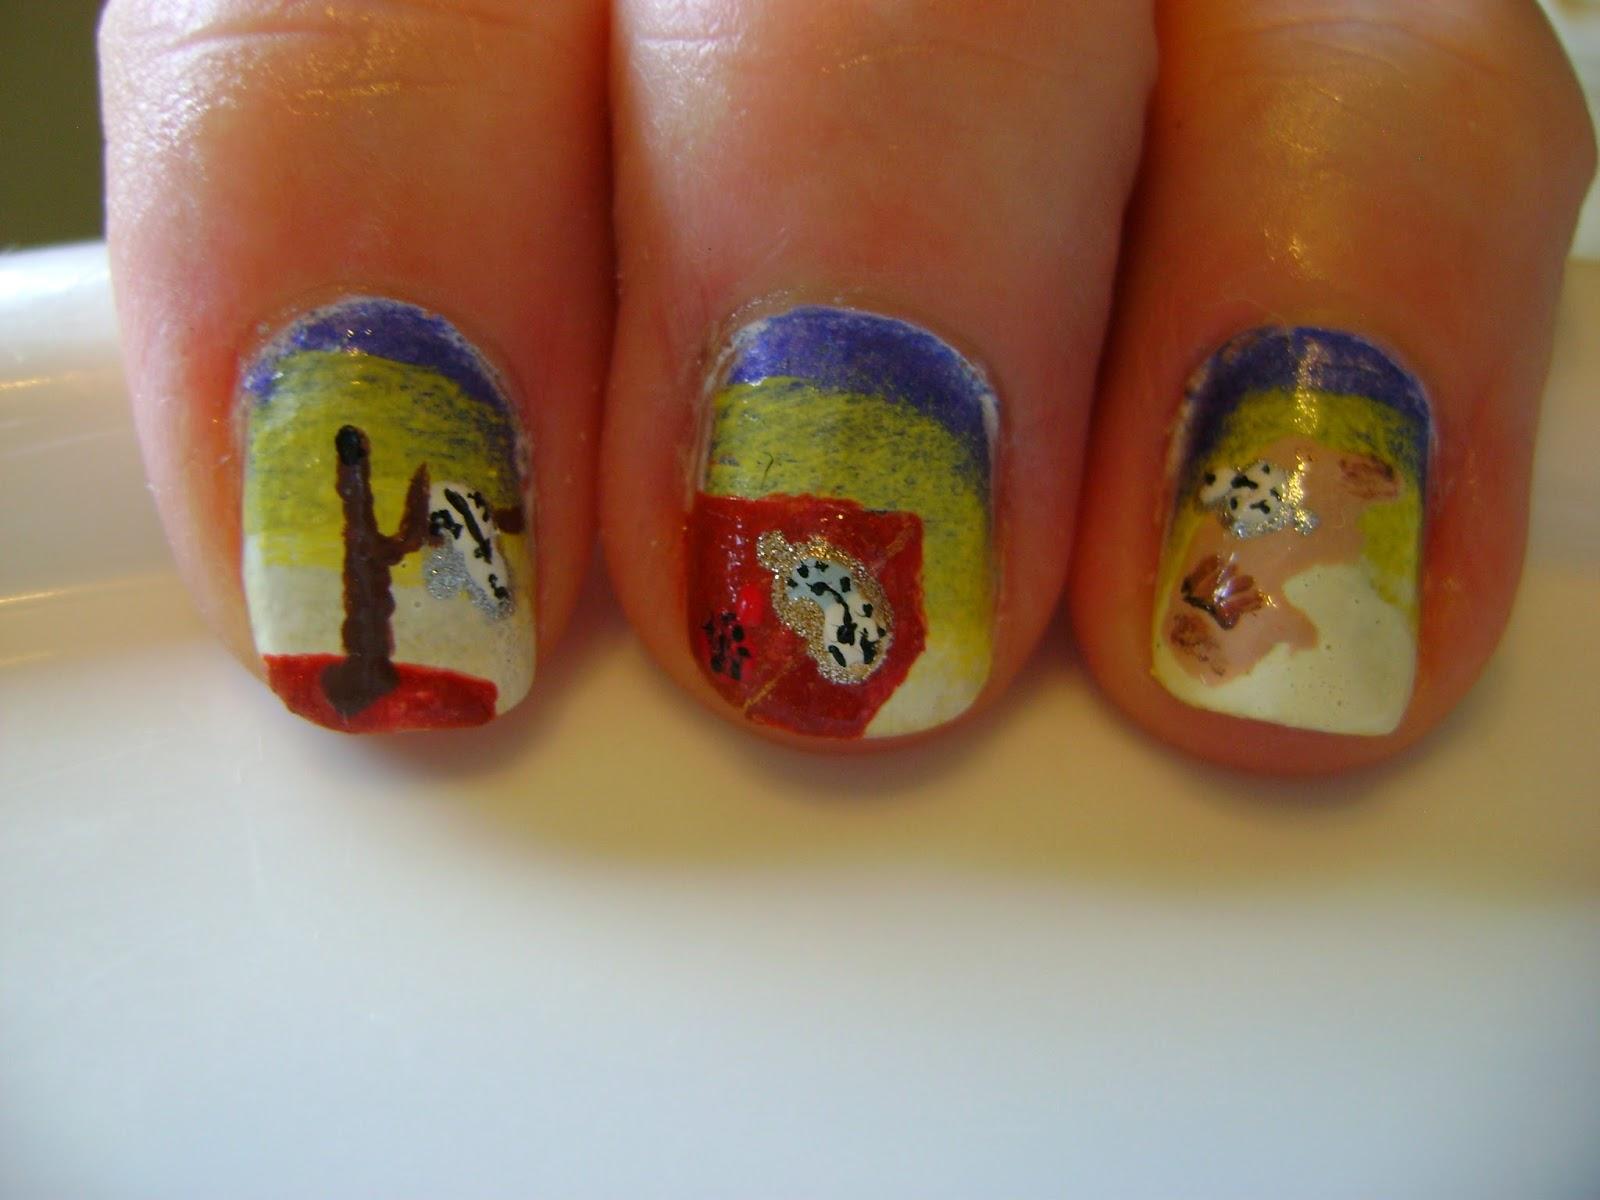 My Nail Art Hobby: Day Twenty-Seven Inspired by Artwork - Salvador ...